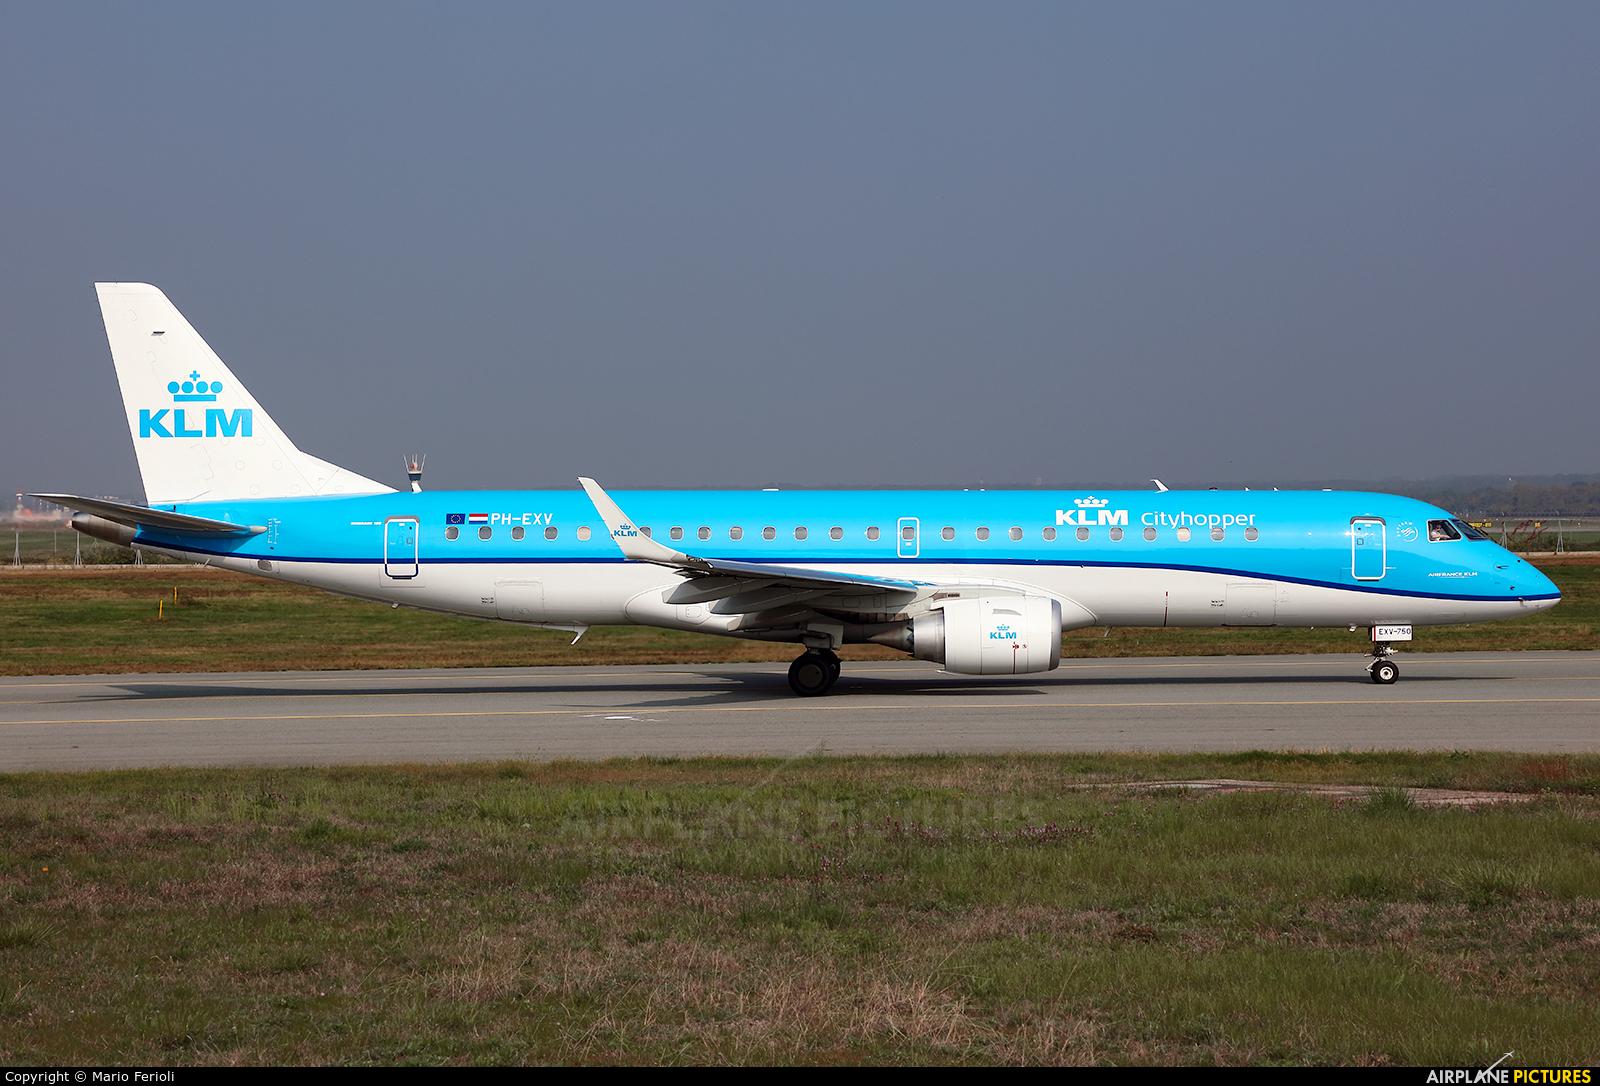 KLM Cityhopper PH-EXV aircraft at Milan - Malpensa